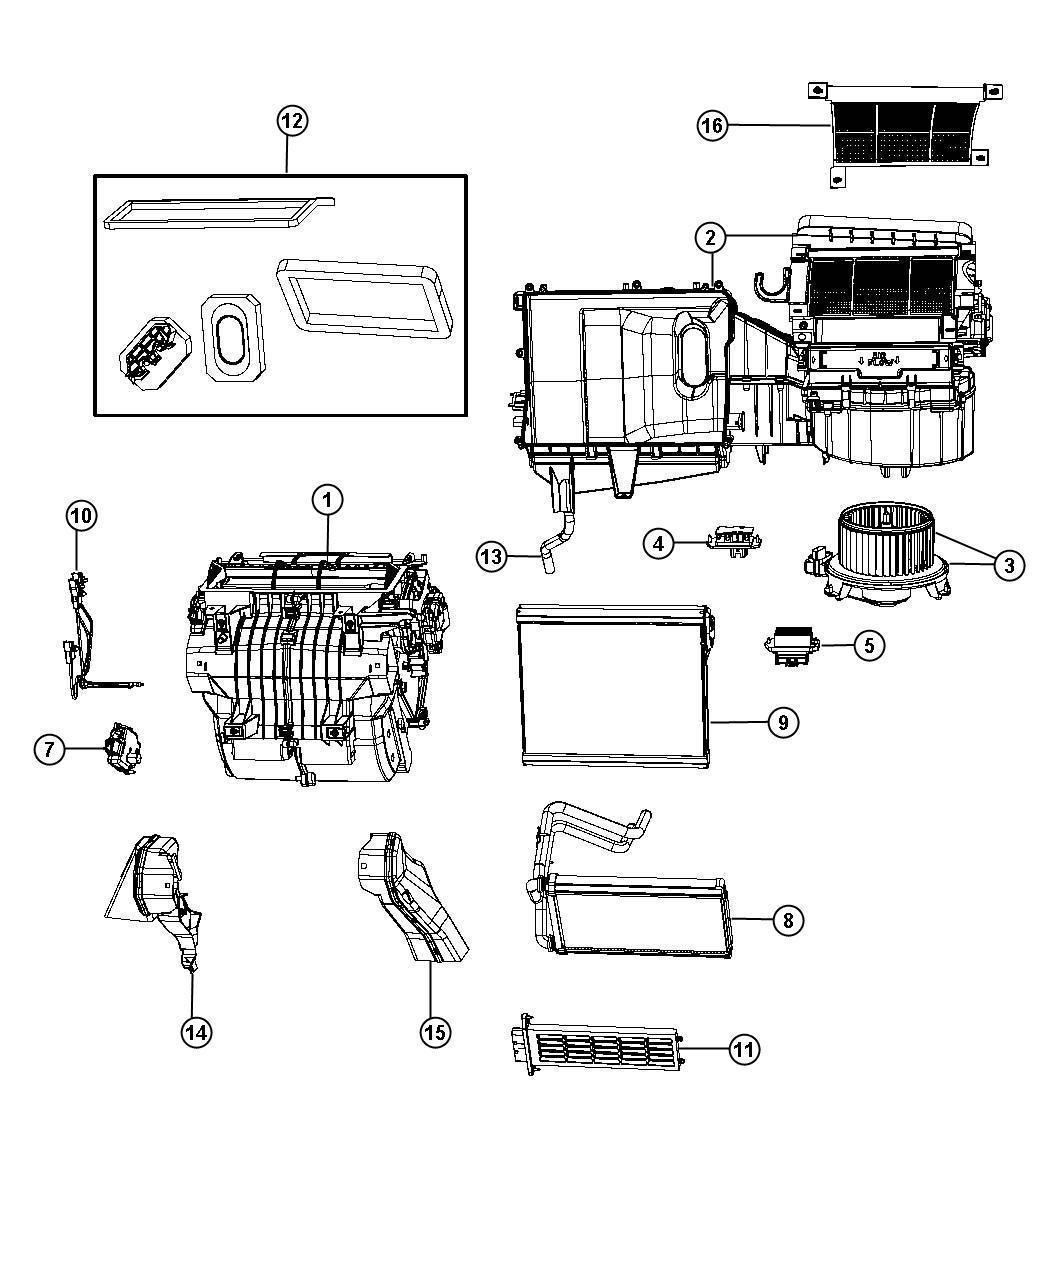 2012 dodge avenger service manual